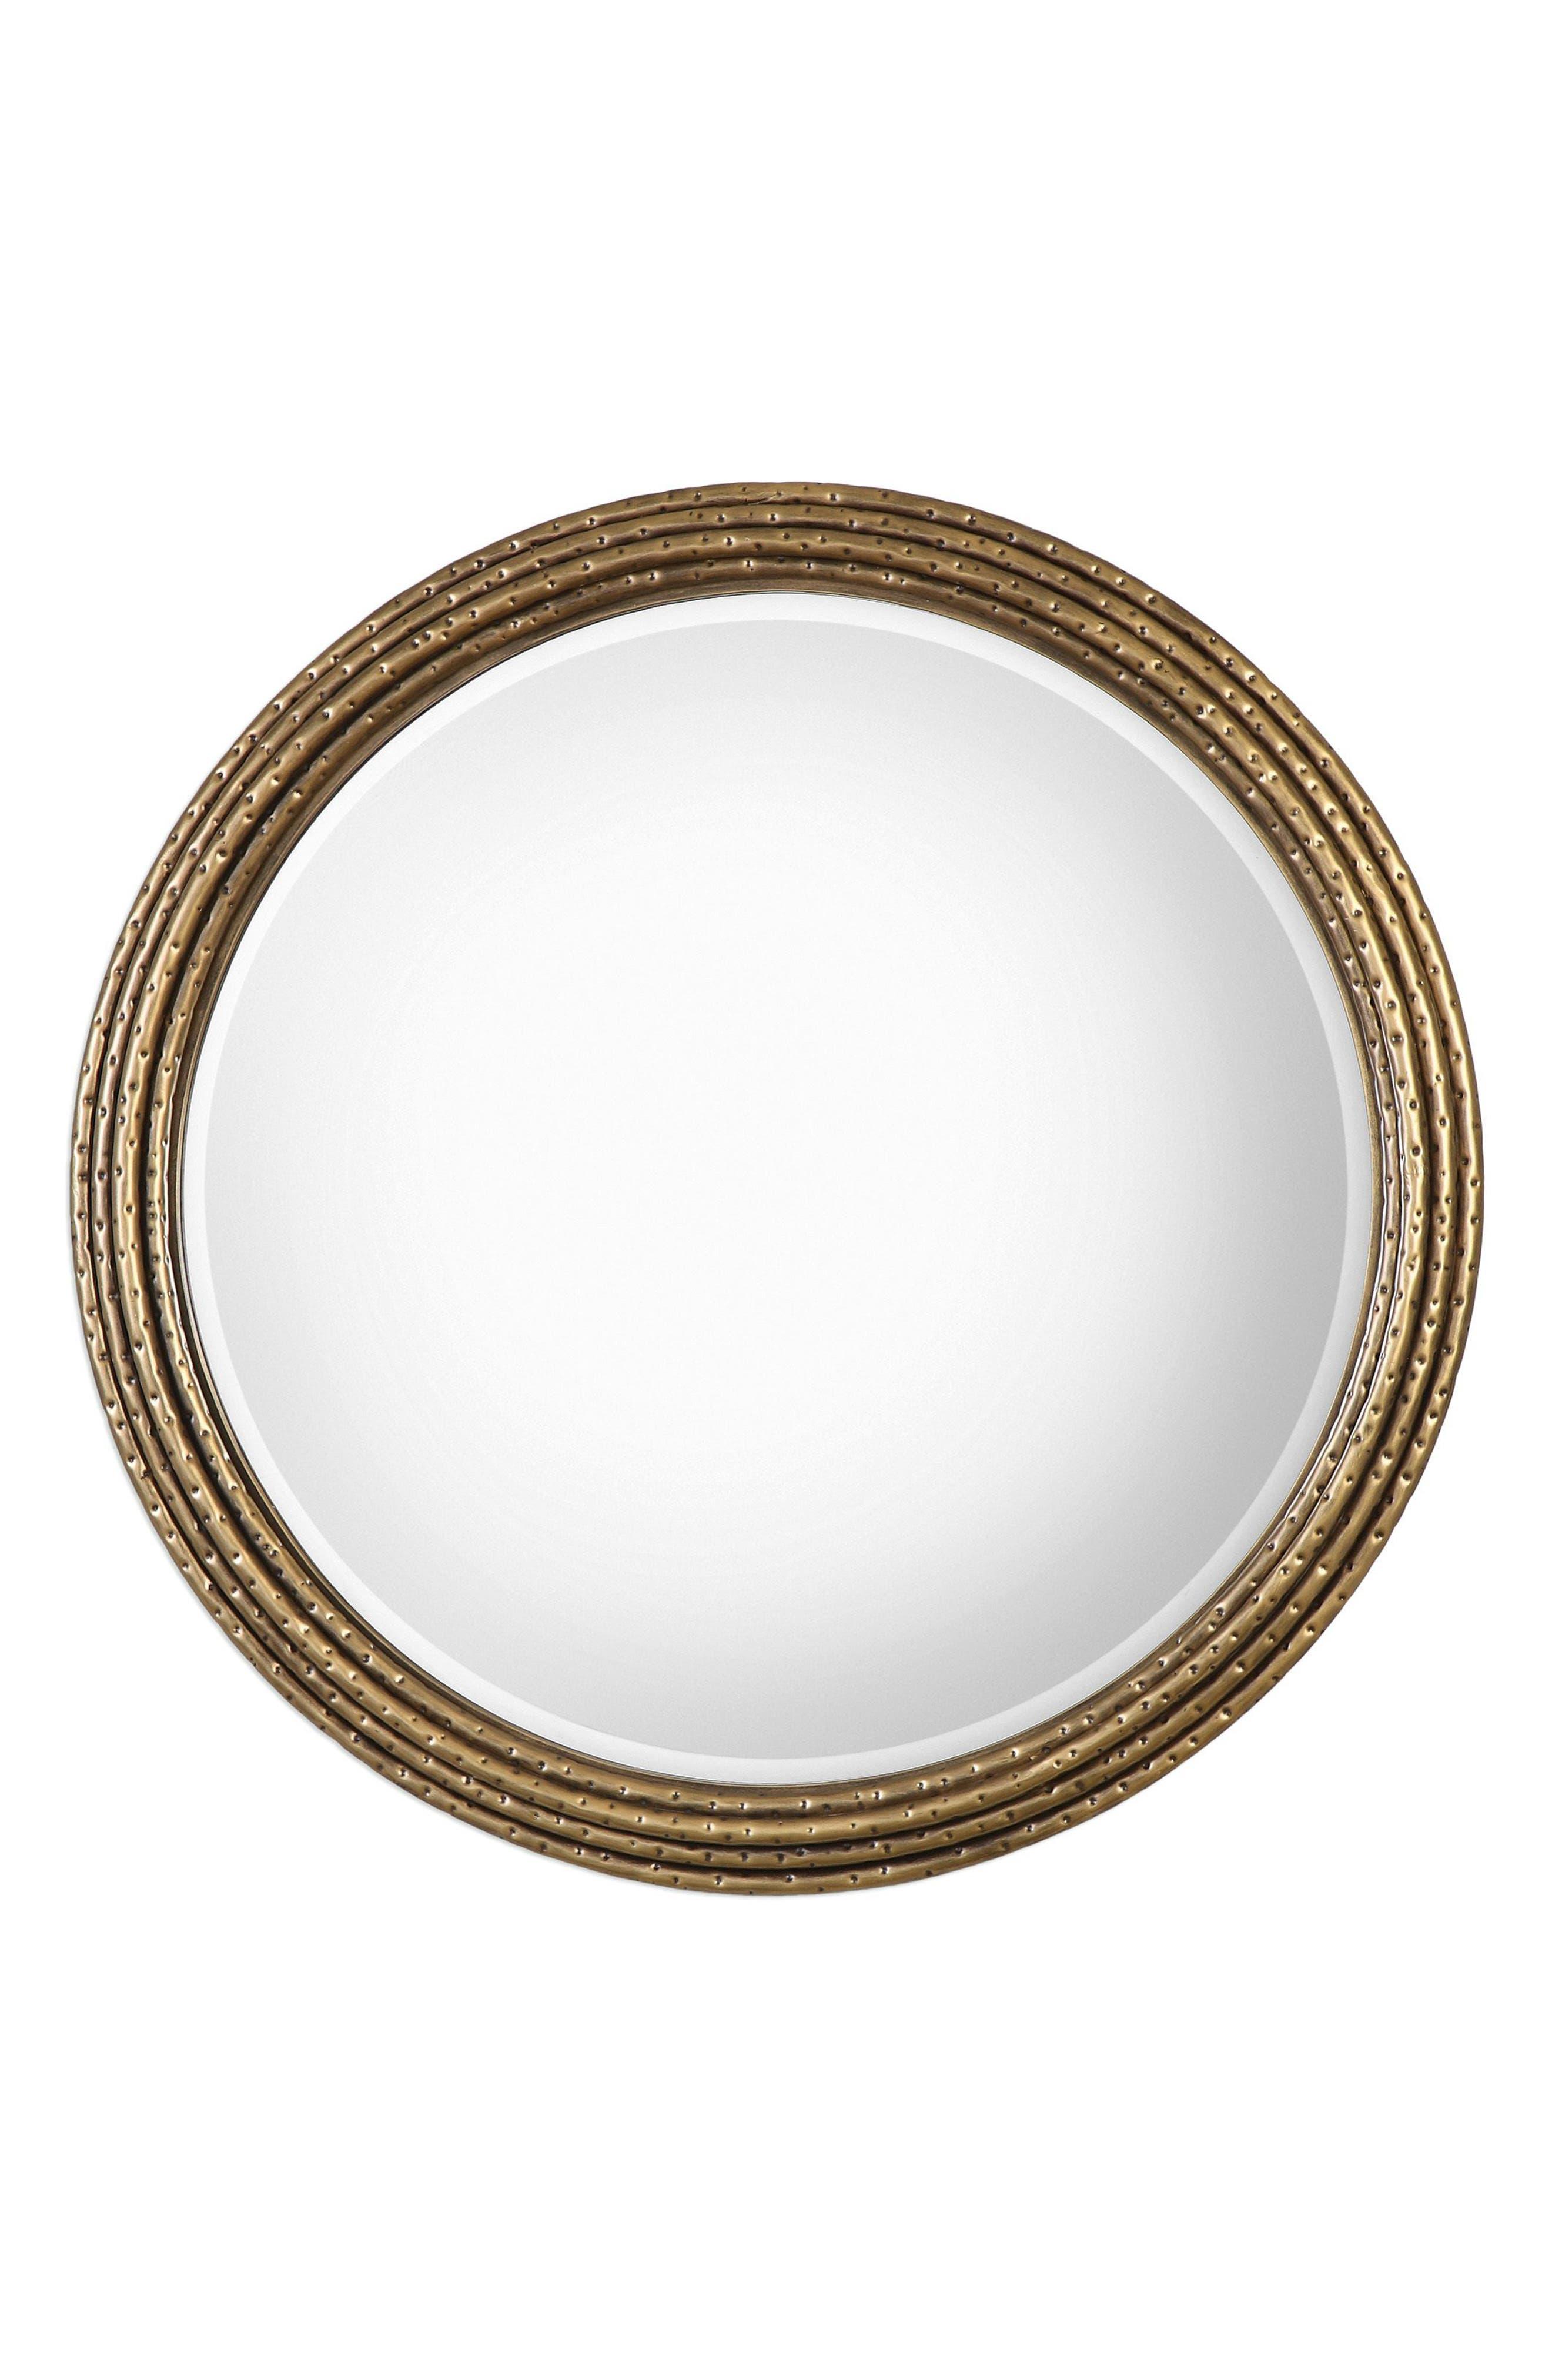 Uttermost Spera Wall Mirror